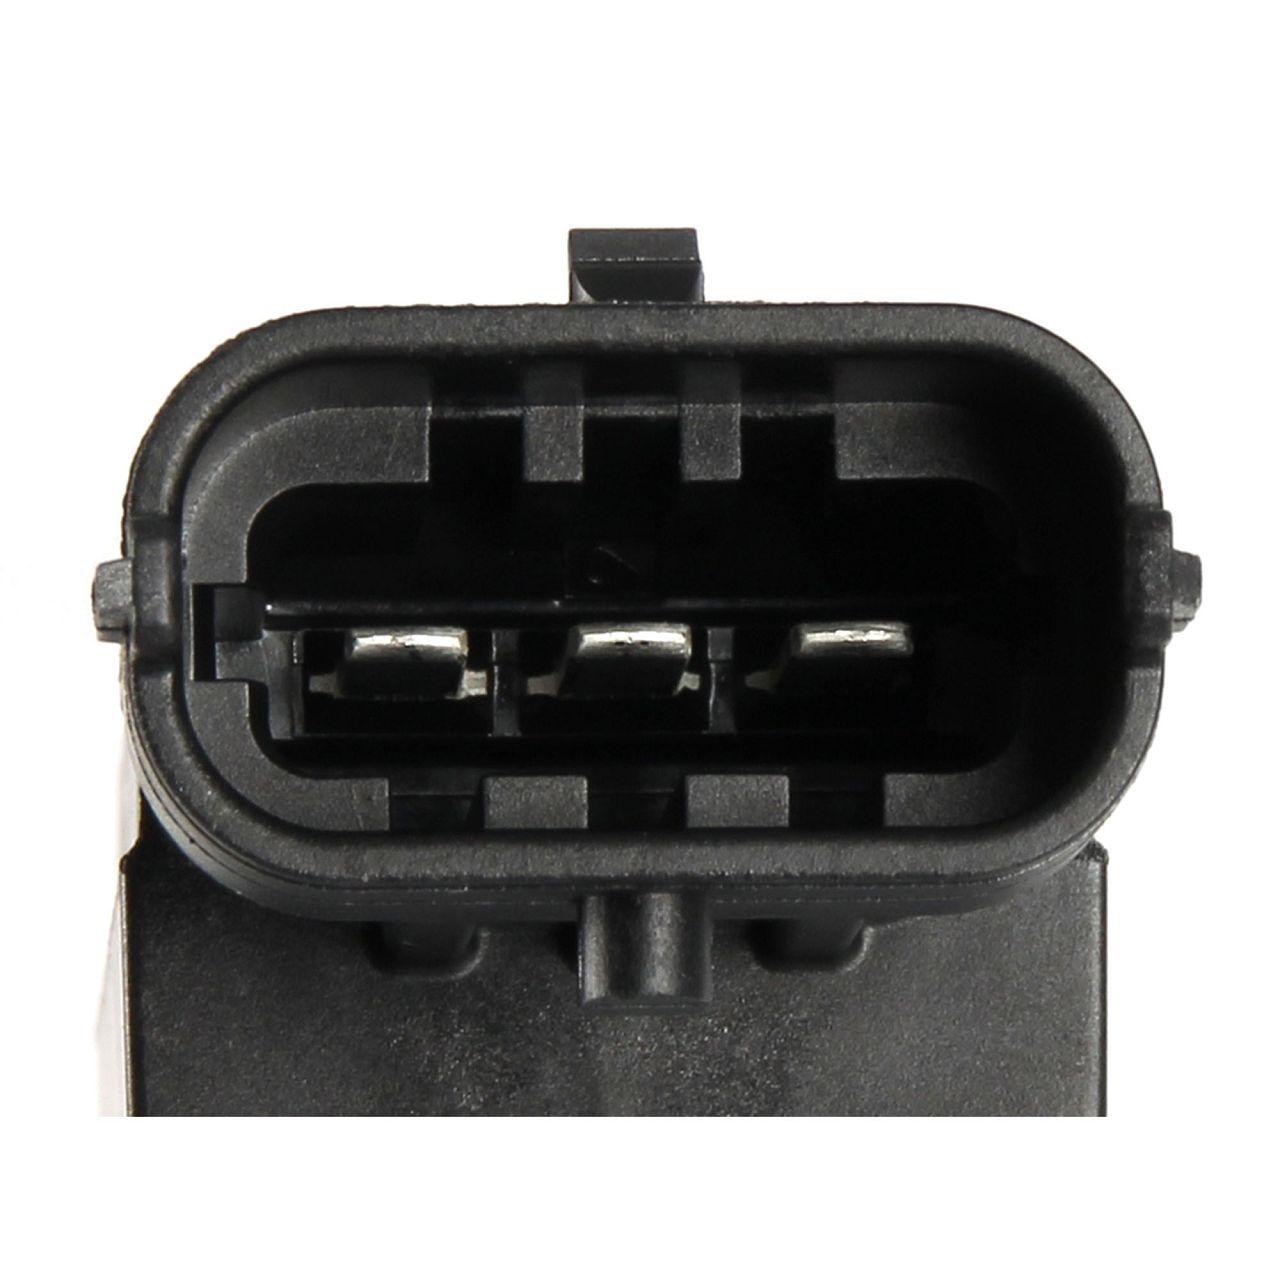 BOSCH 0281002996 Ladedrucksensor für FIAT NISSAN OPEL RENAULT ABARTH ALFA ROMEO